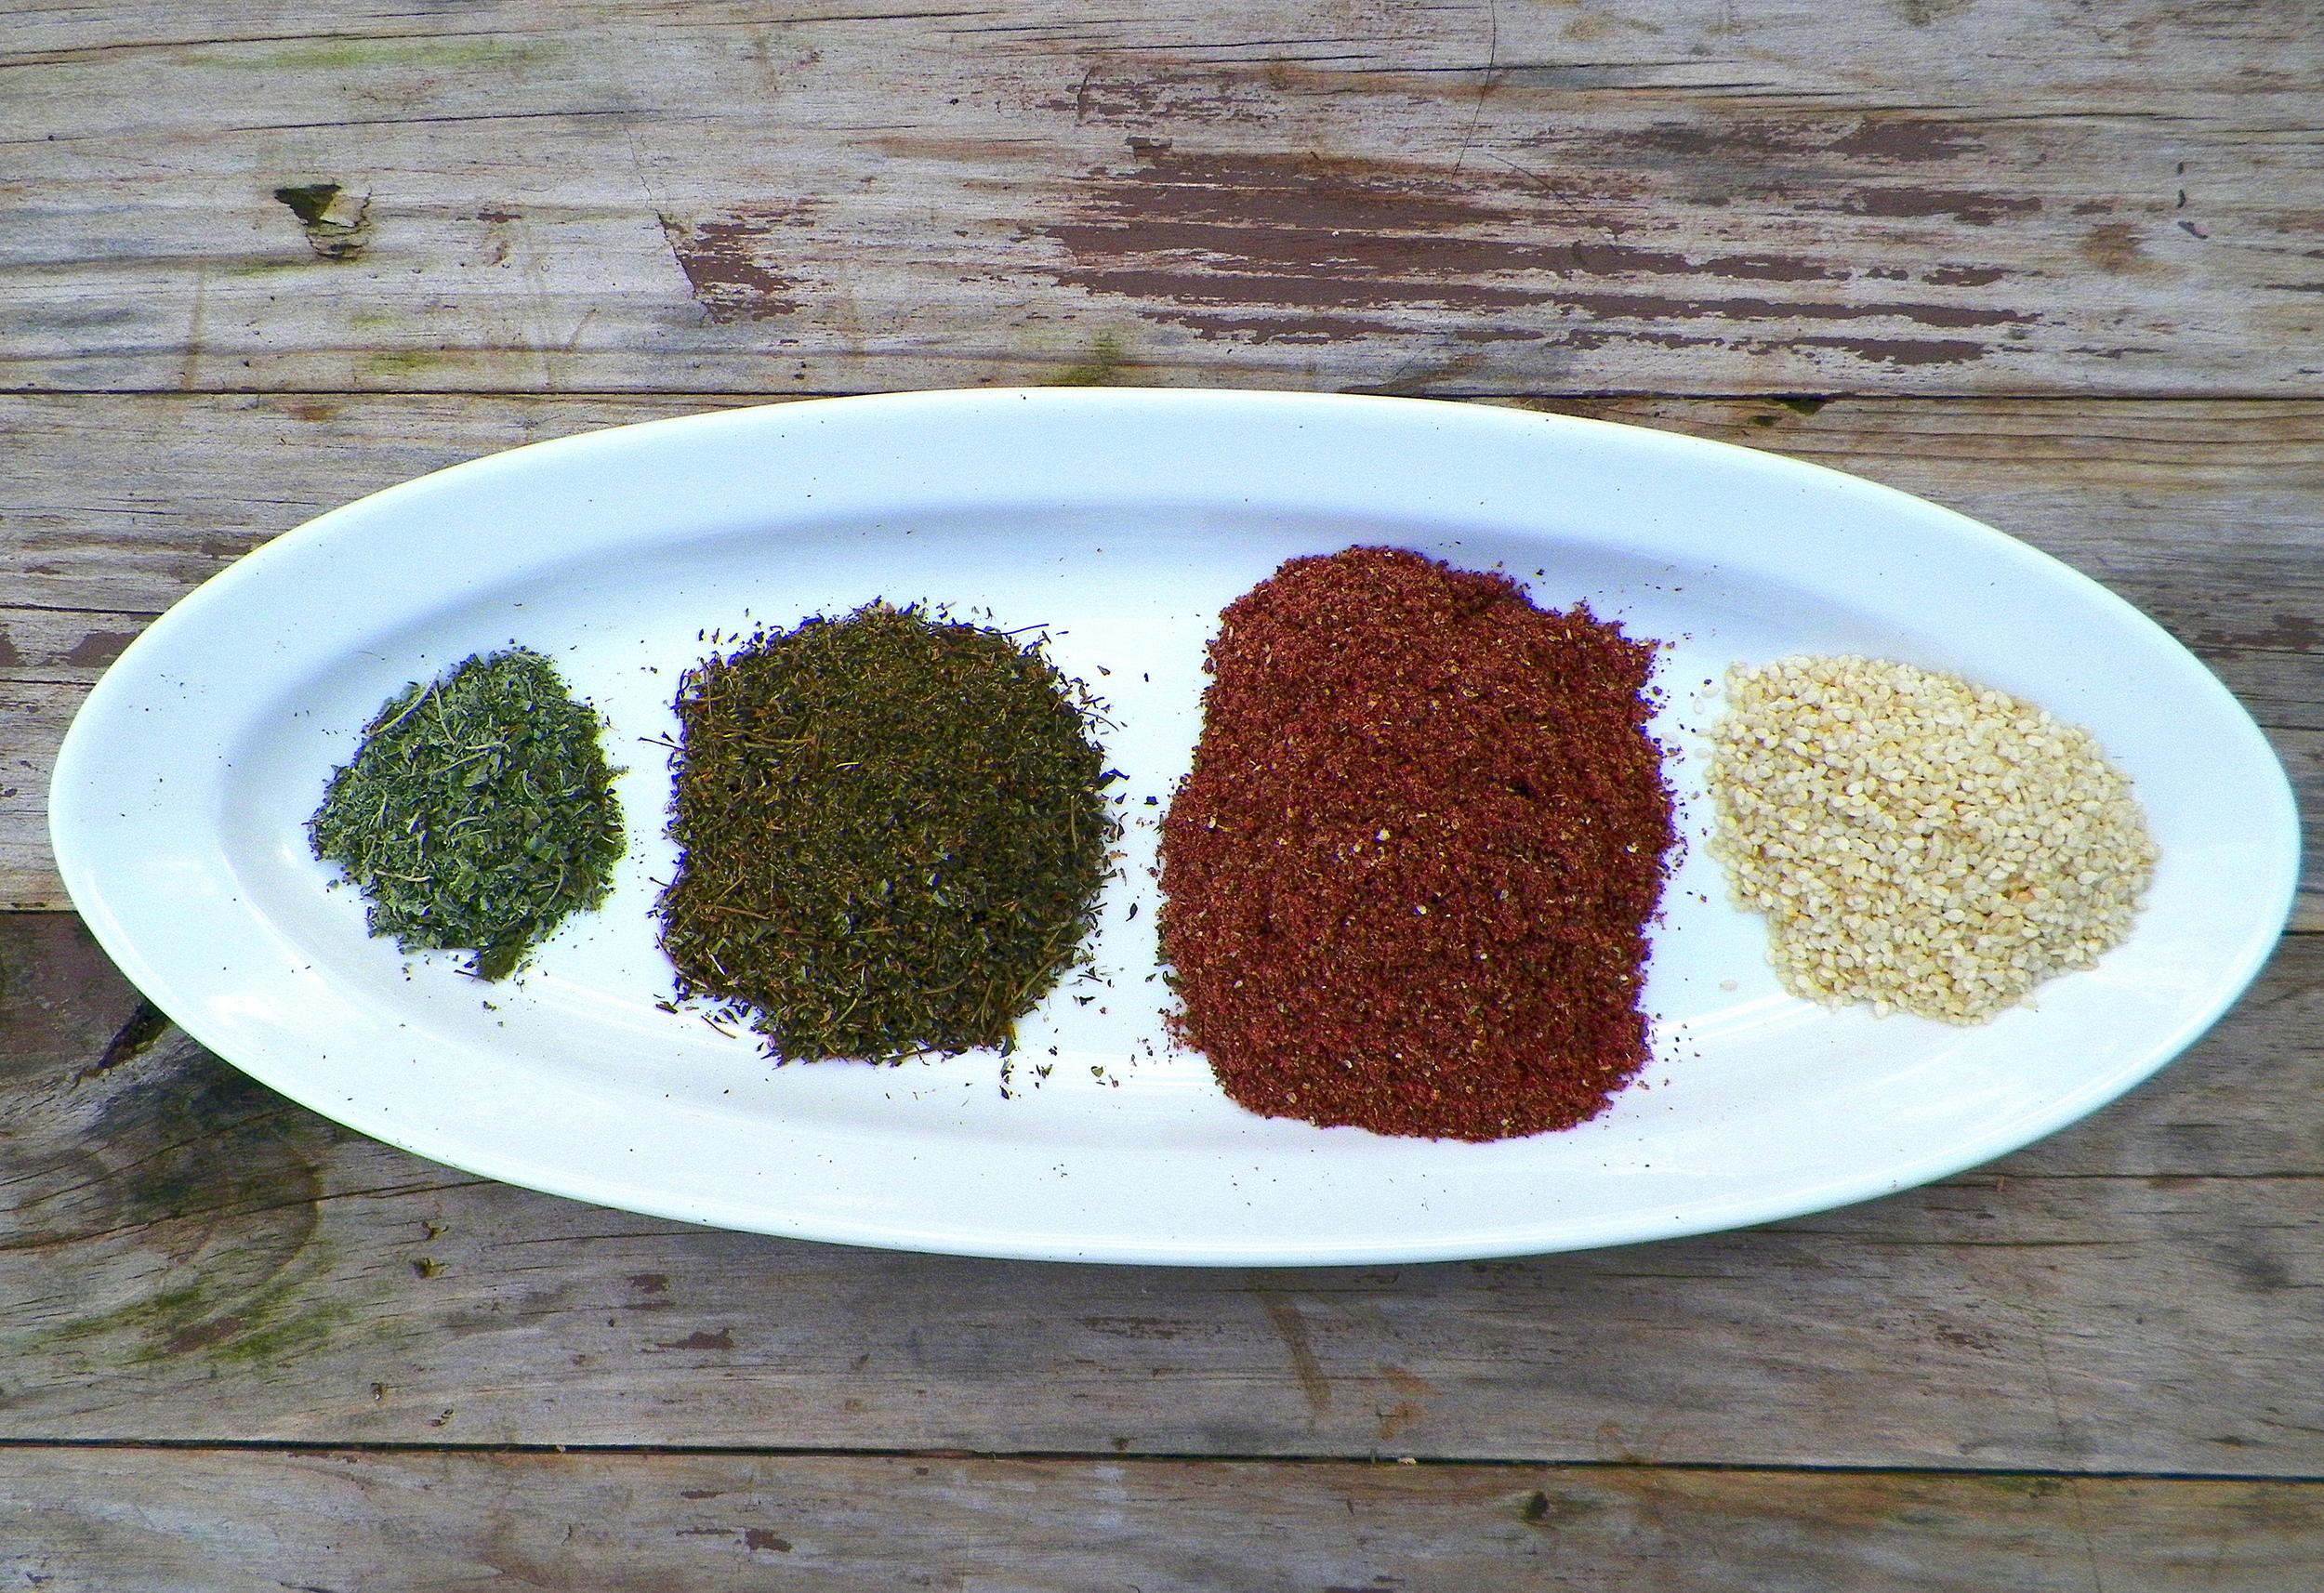 Oregano, thyme, sumac, sesame seeds.